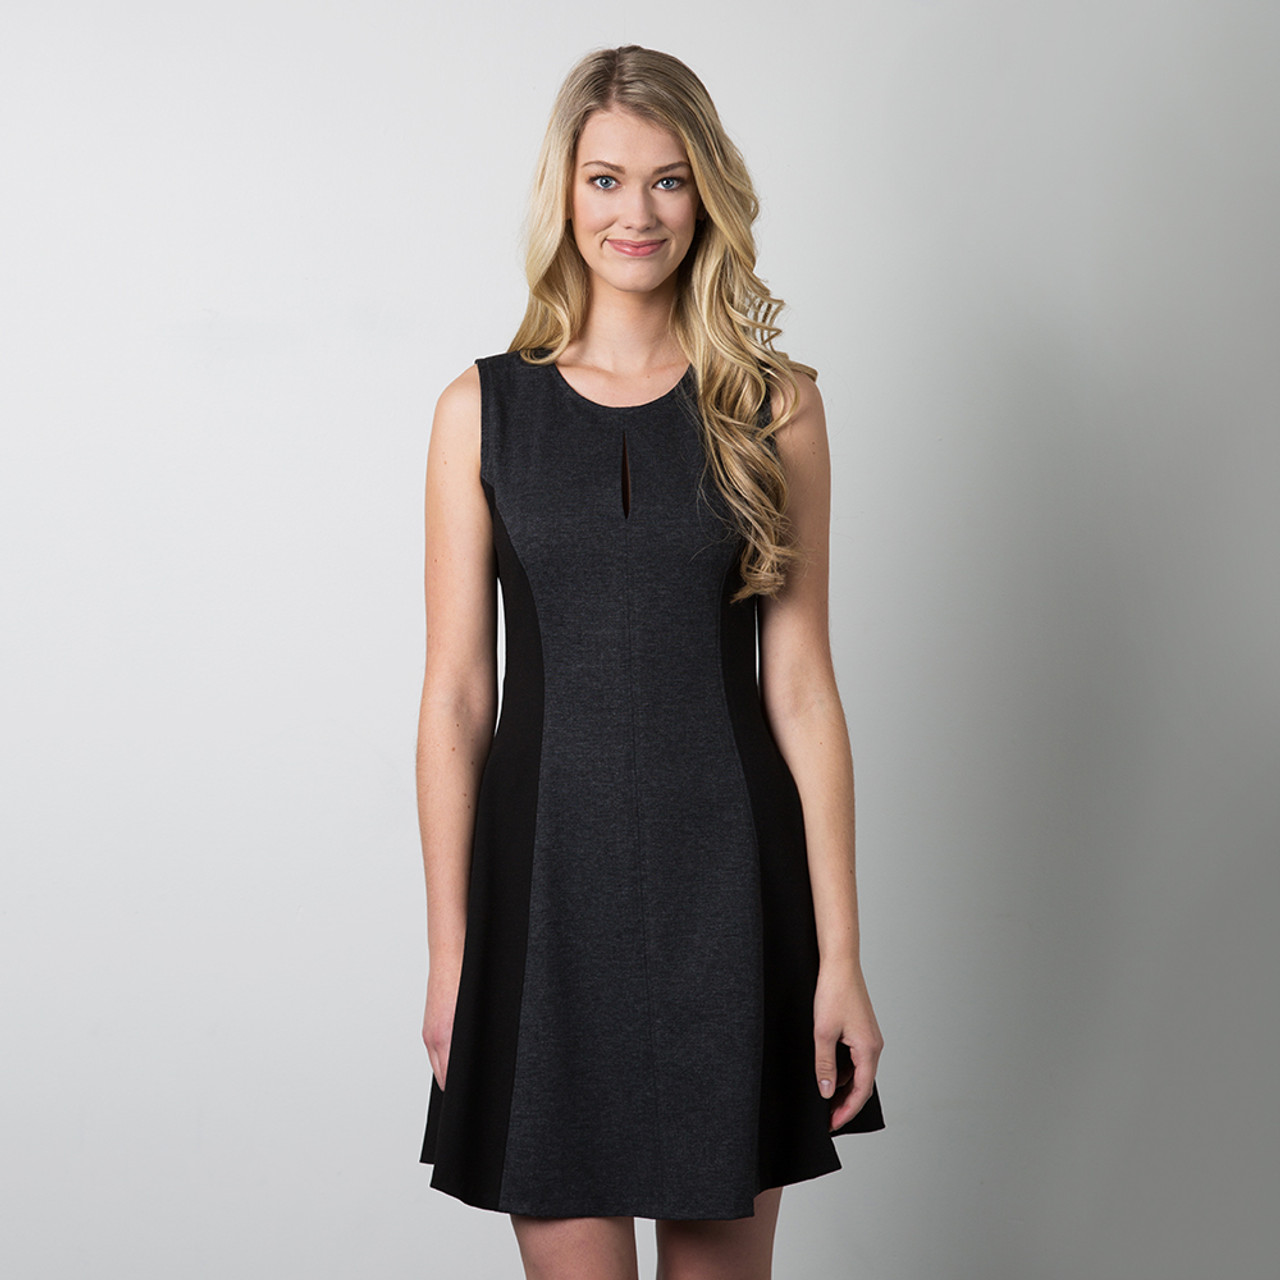 b96f9af8e4d Davie Dress sewing pattern by Sewaholic Patterns with keyhole ...